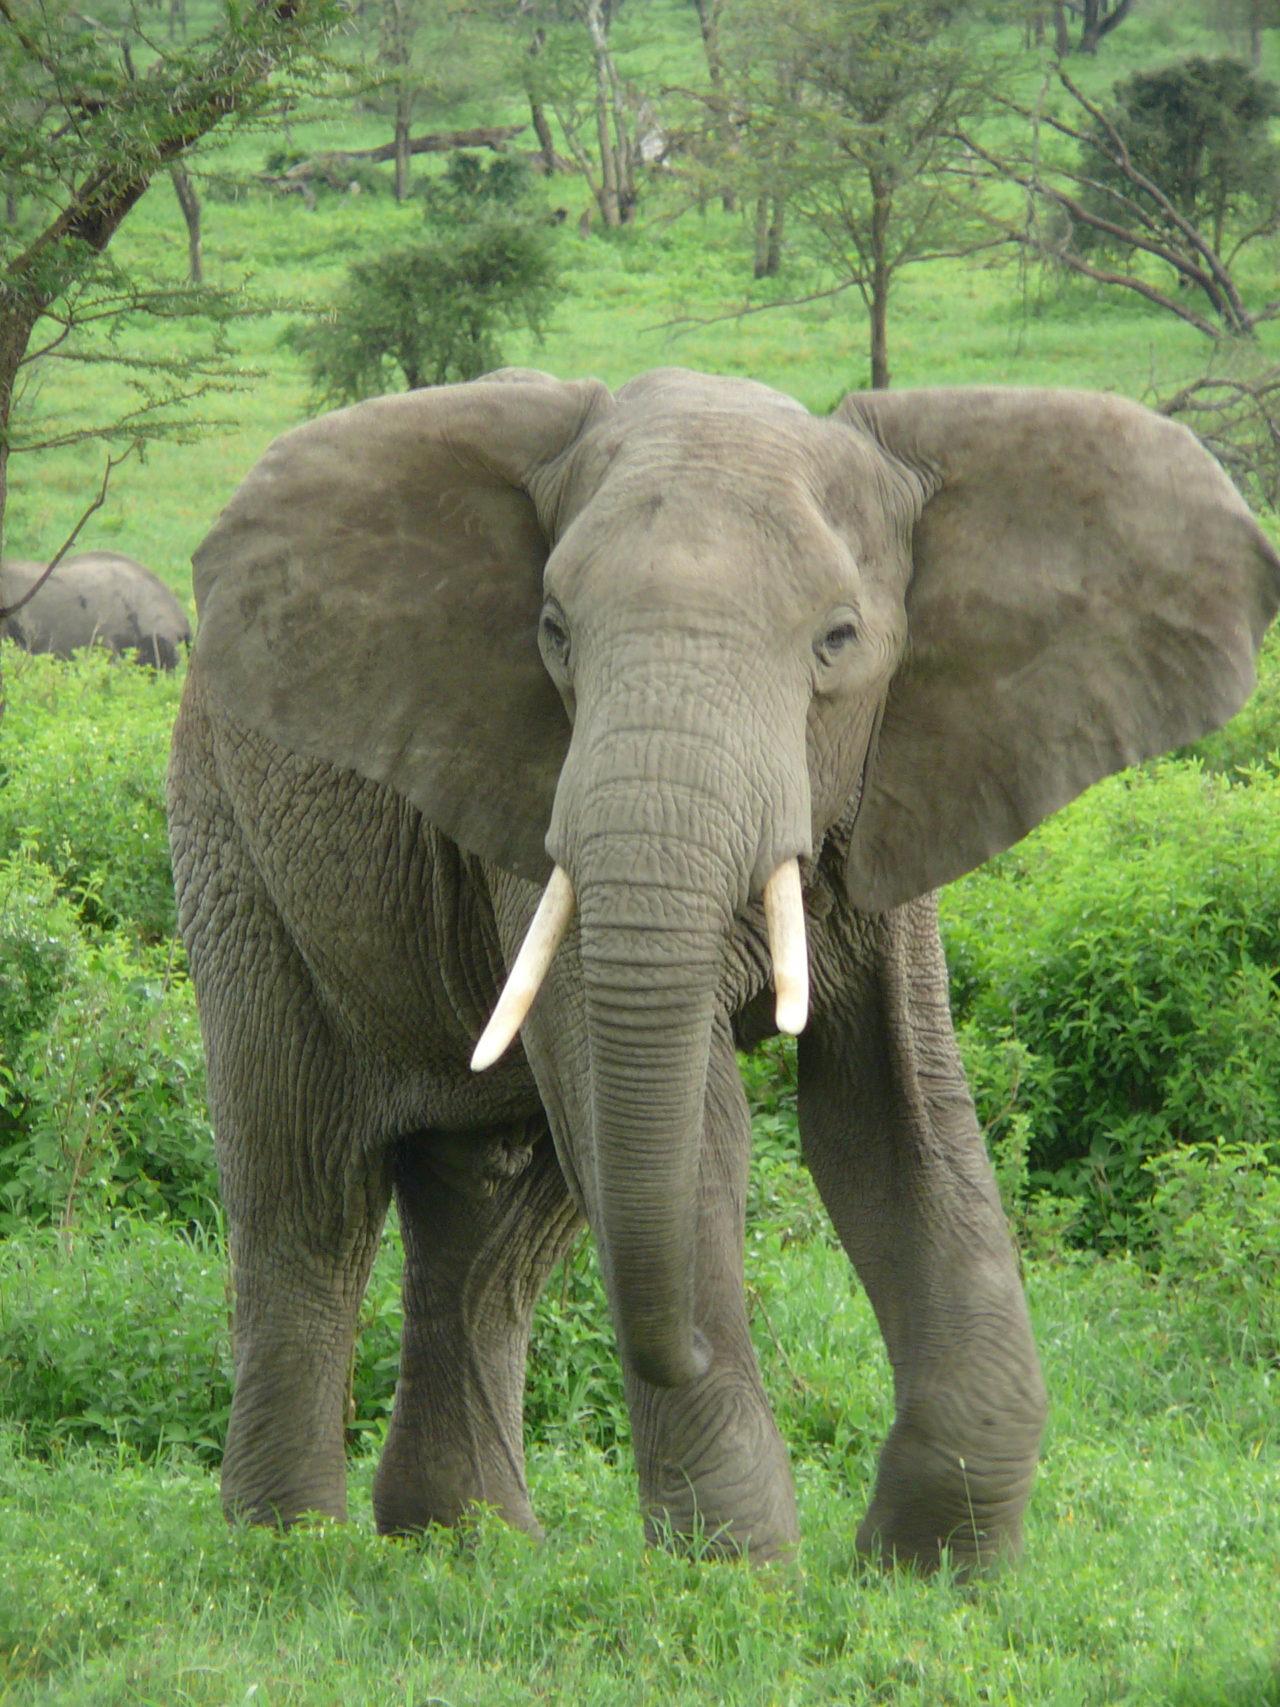 Elephant, Côte d'Ivoire (Ivory Coast)